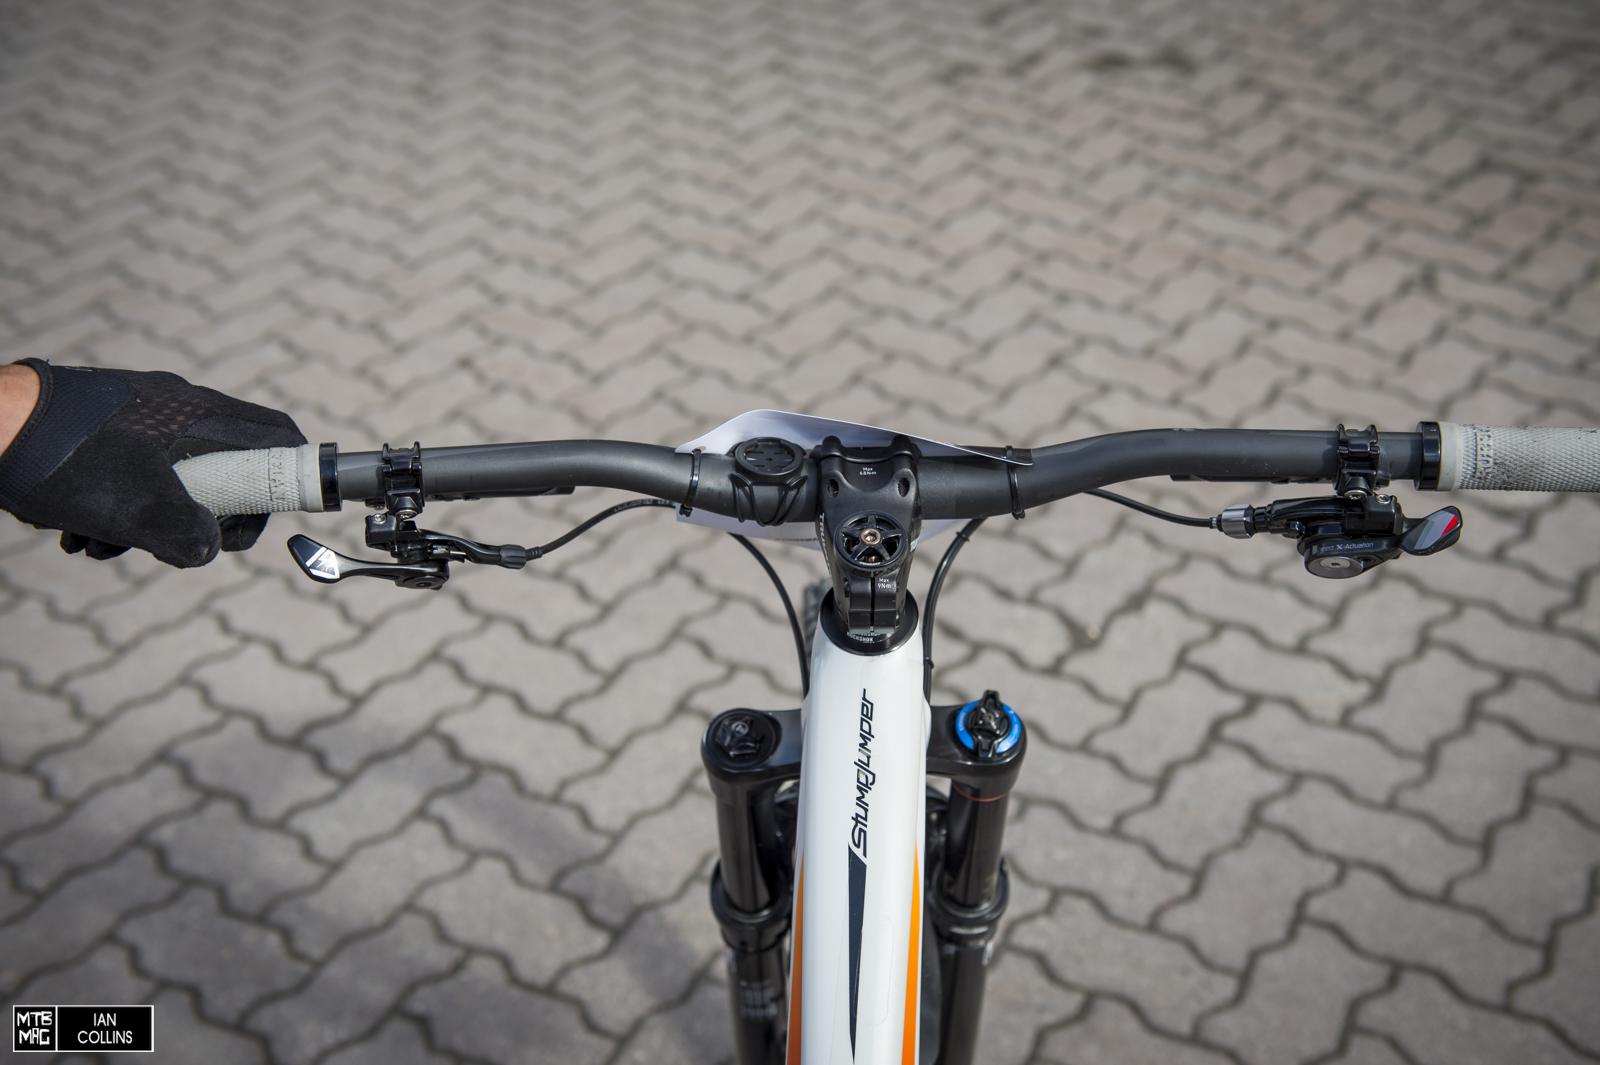 Rider's view.